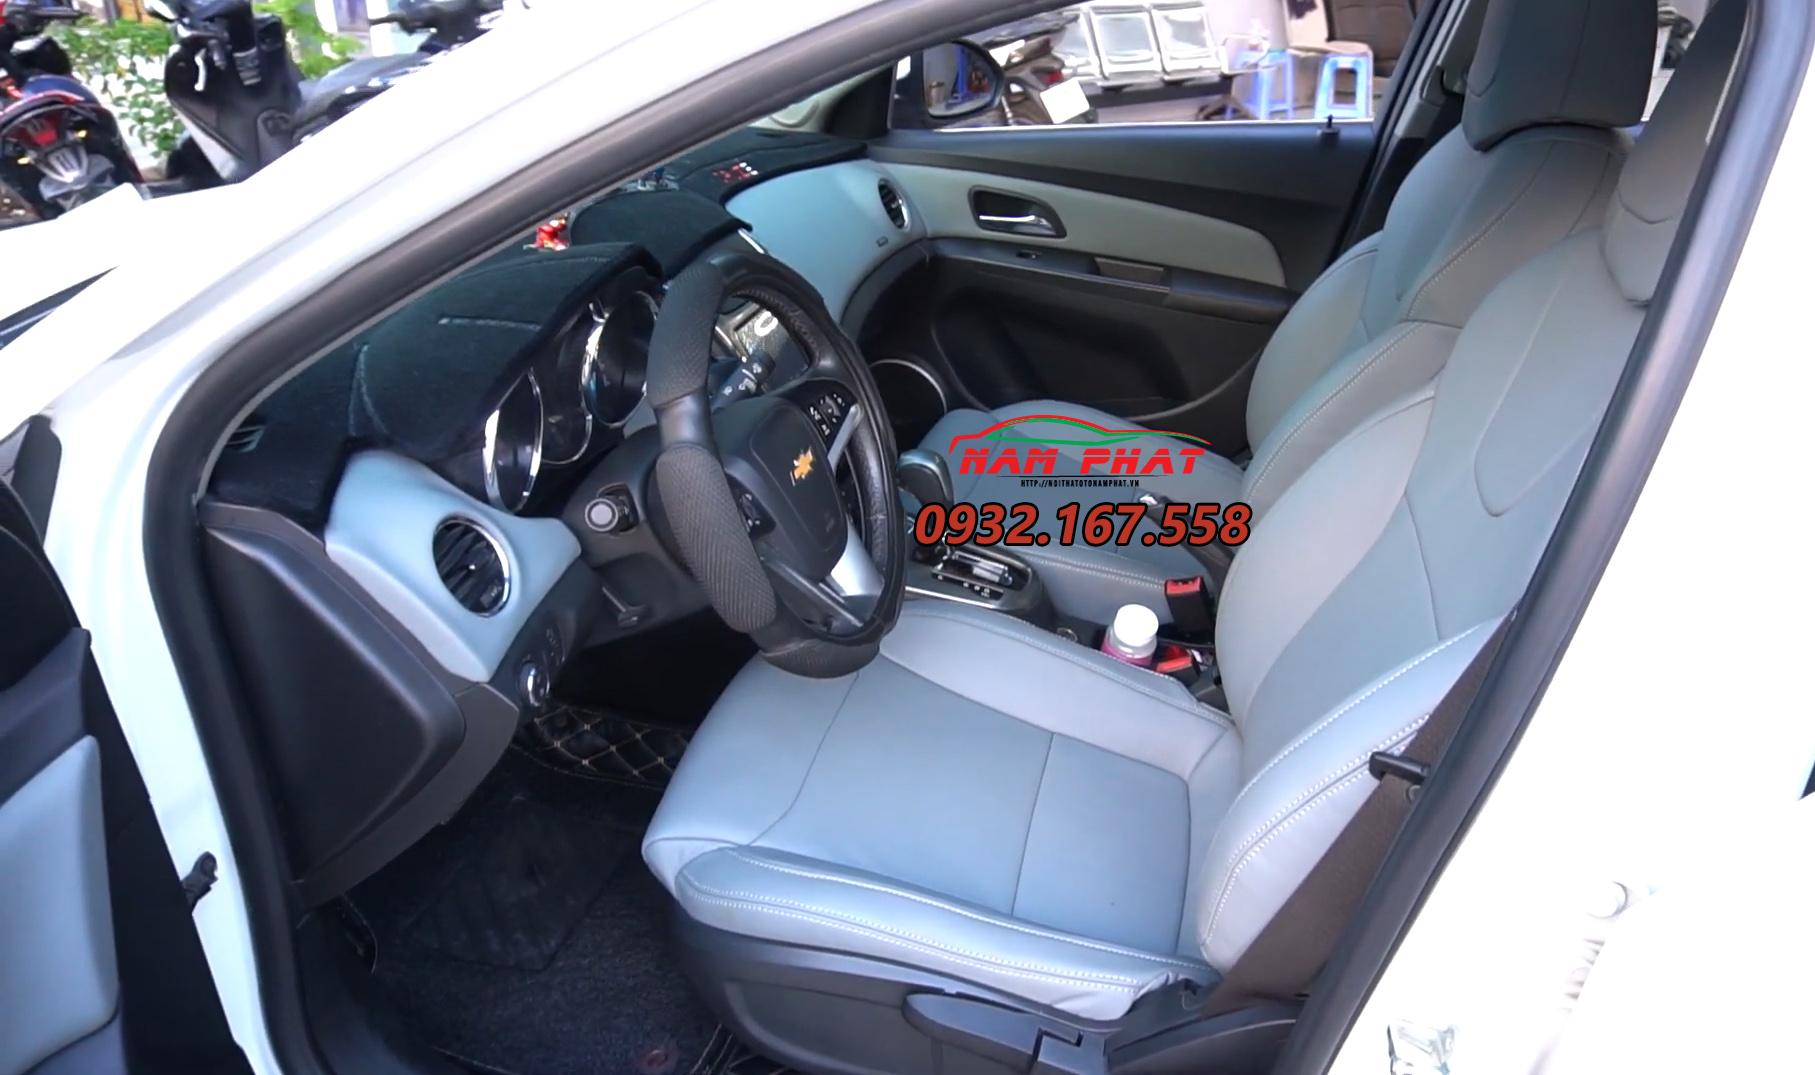 Thay ghế da xe cho ô tô: Bọc ghế da xe cho Chevrolet Cruze